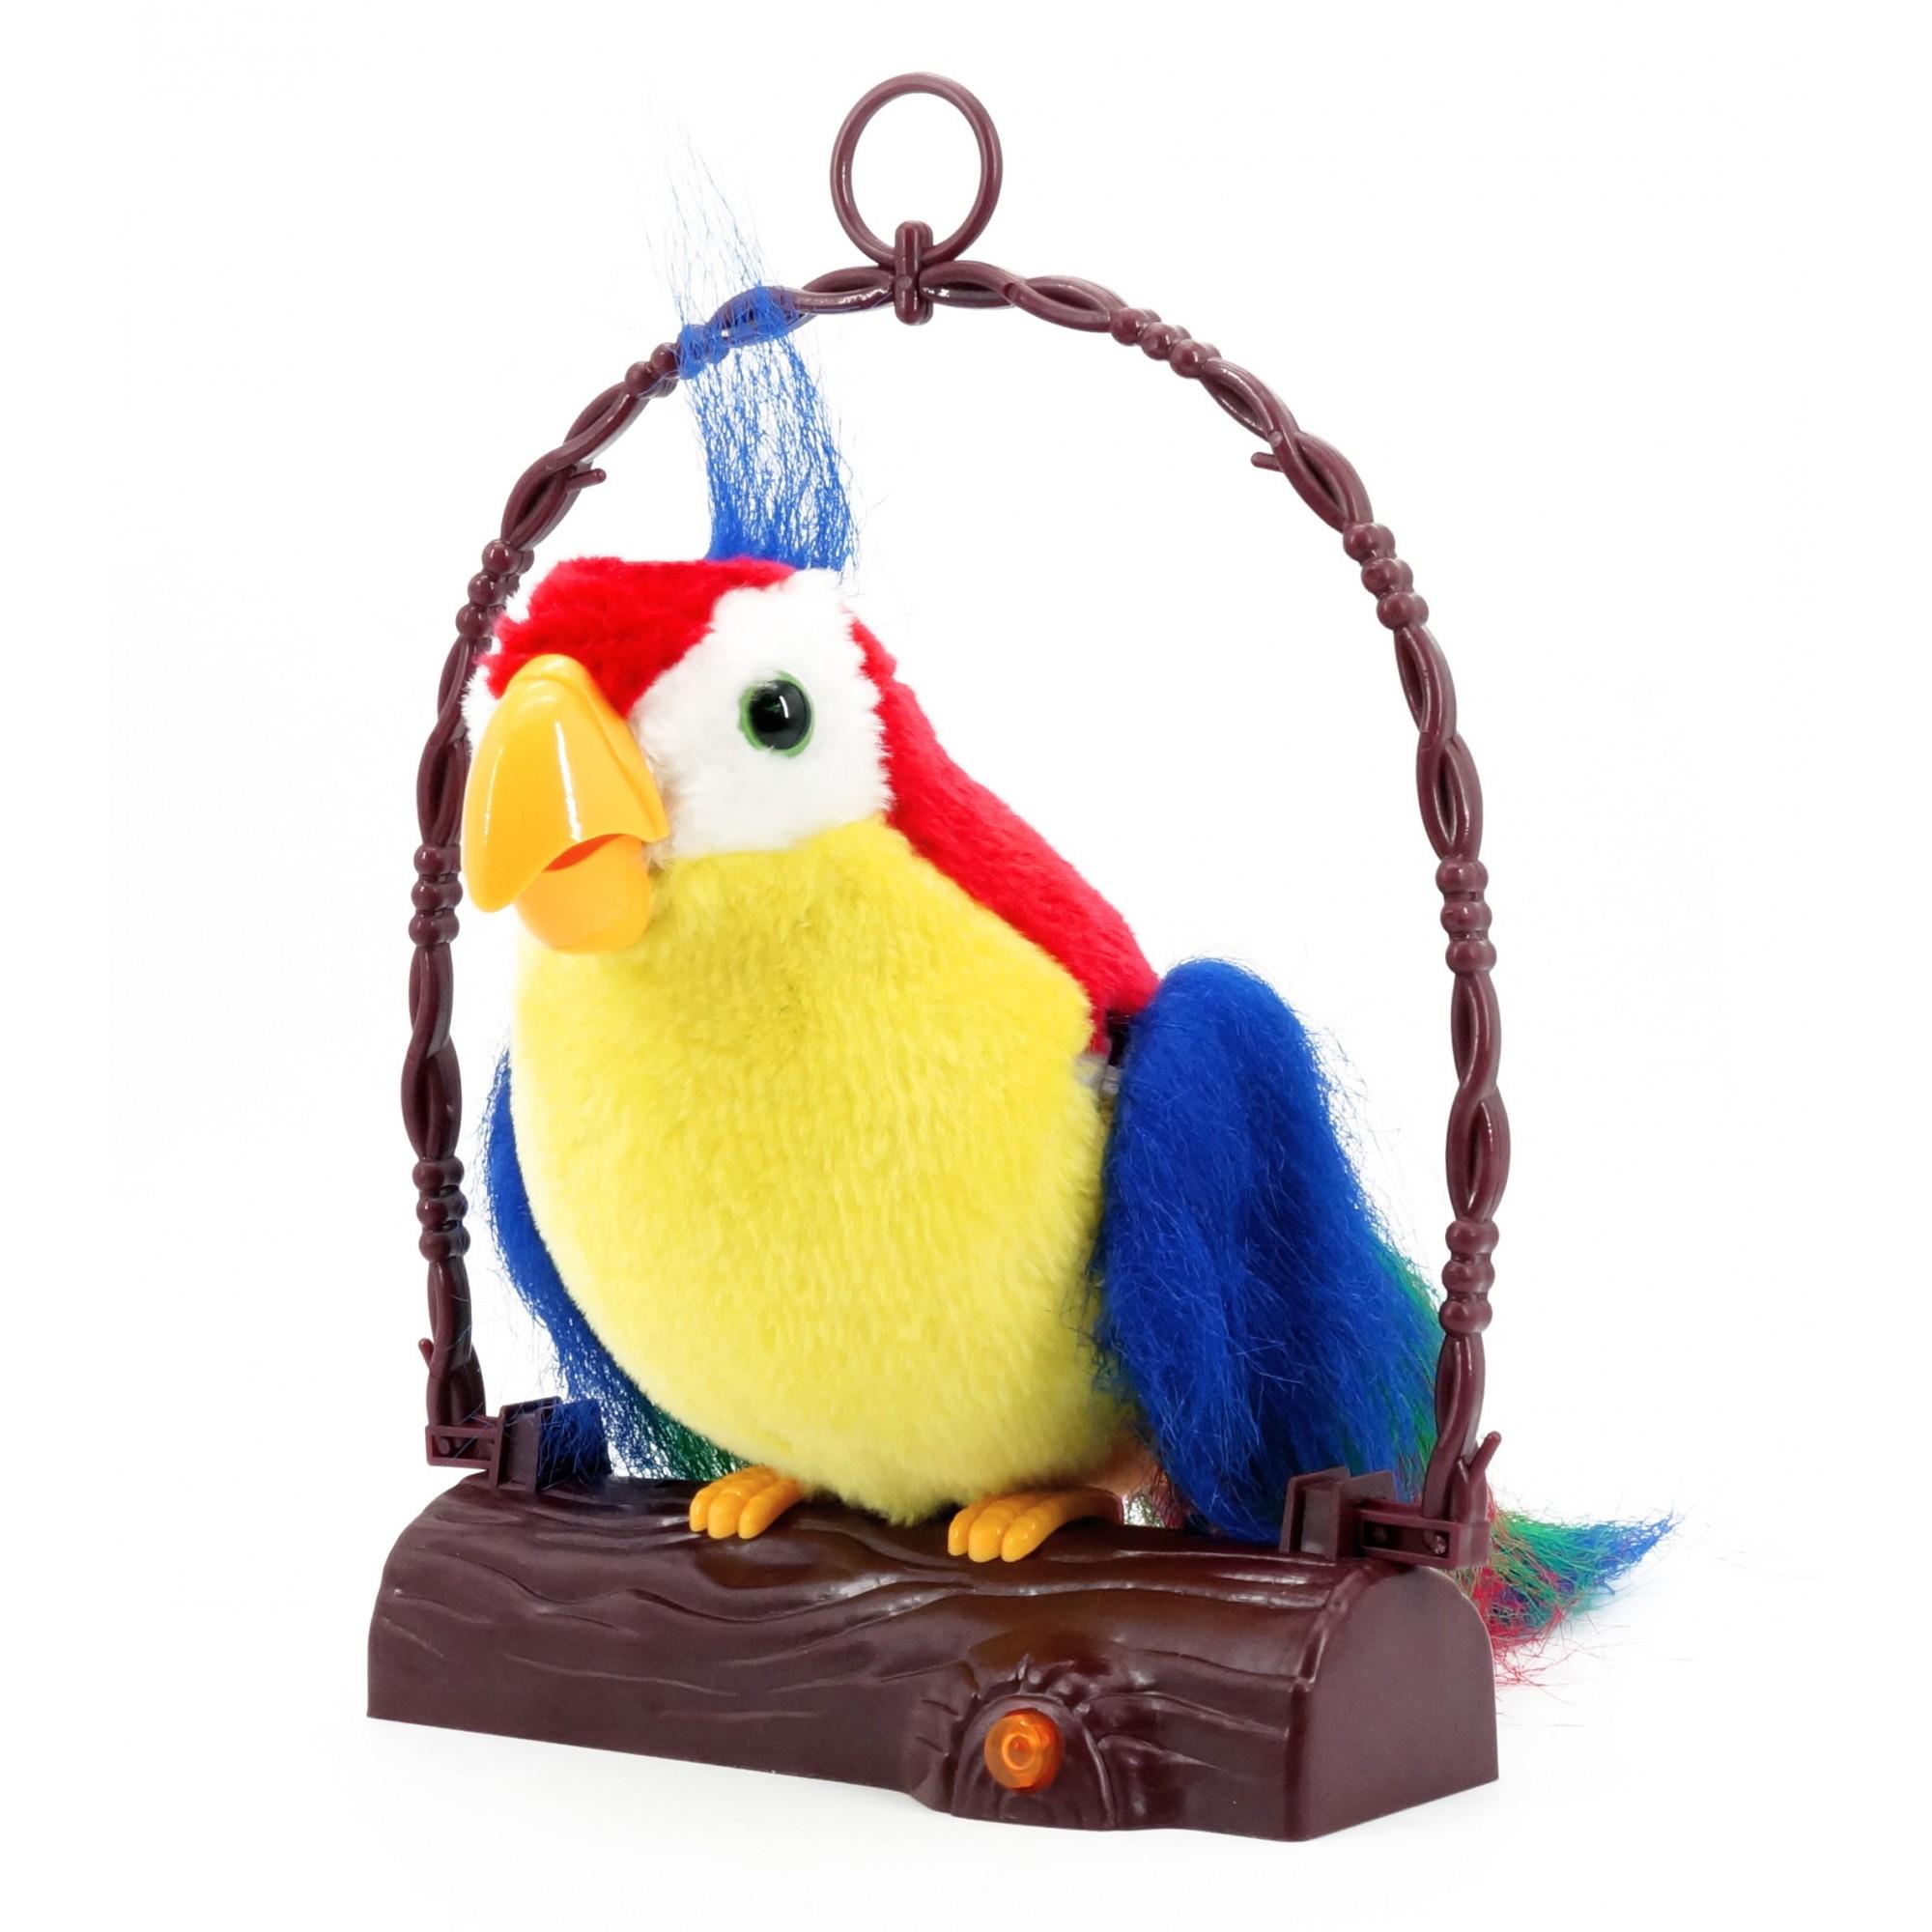 B/O Talking Parrot